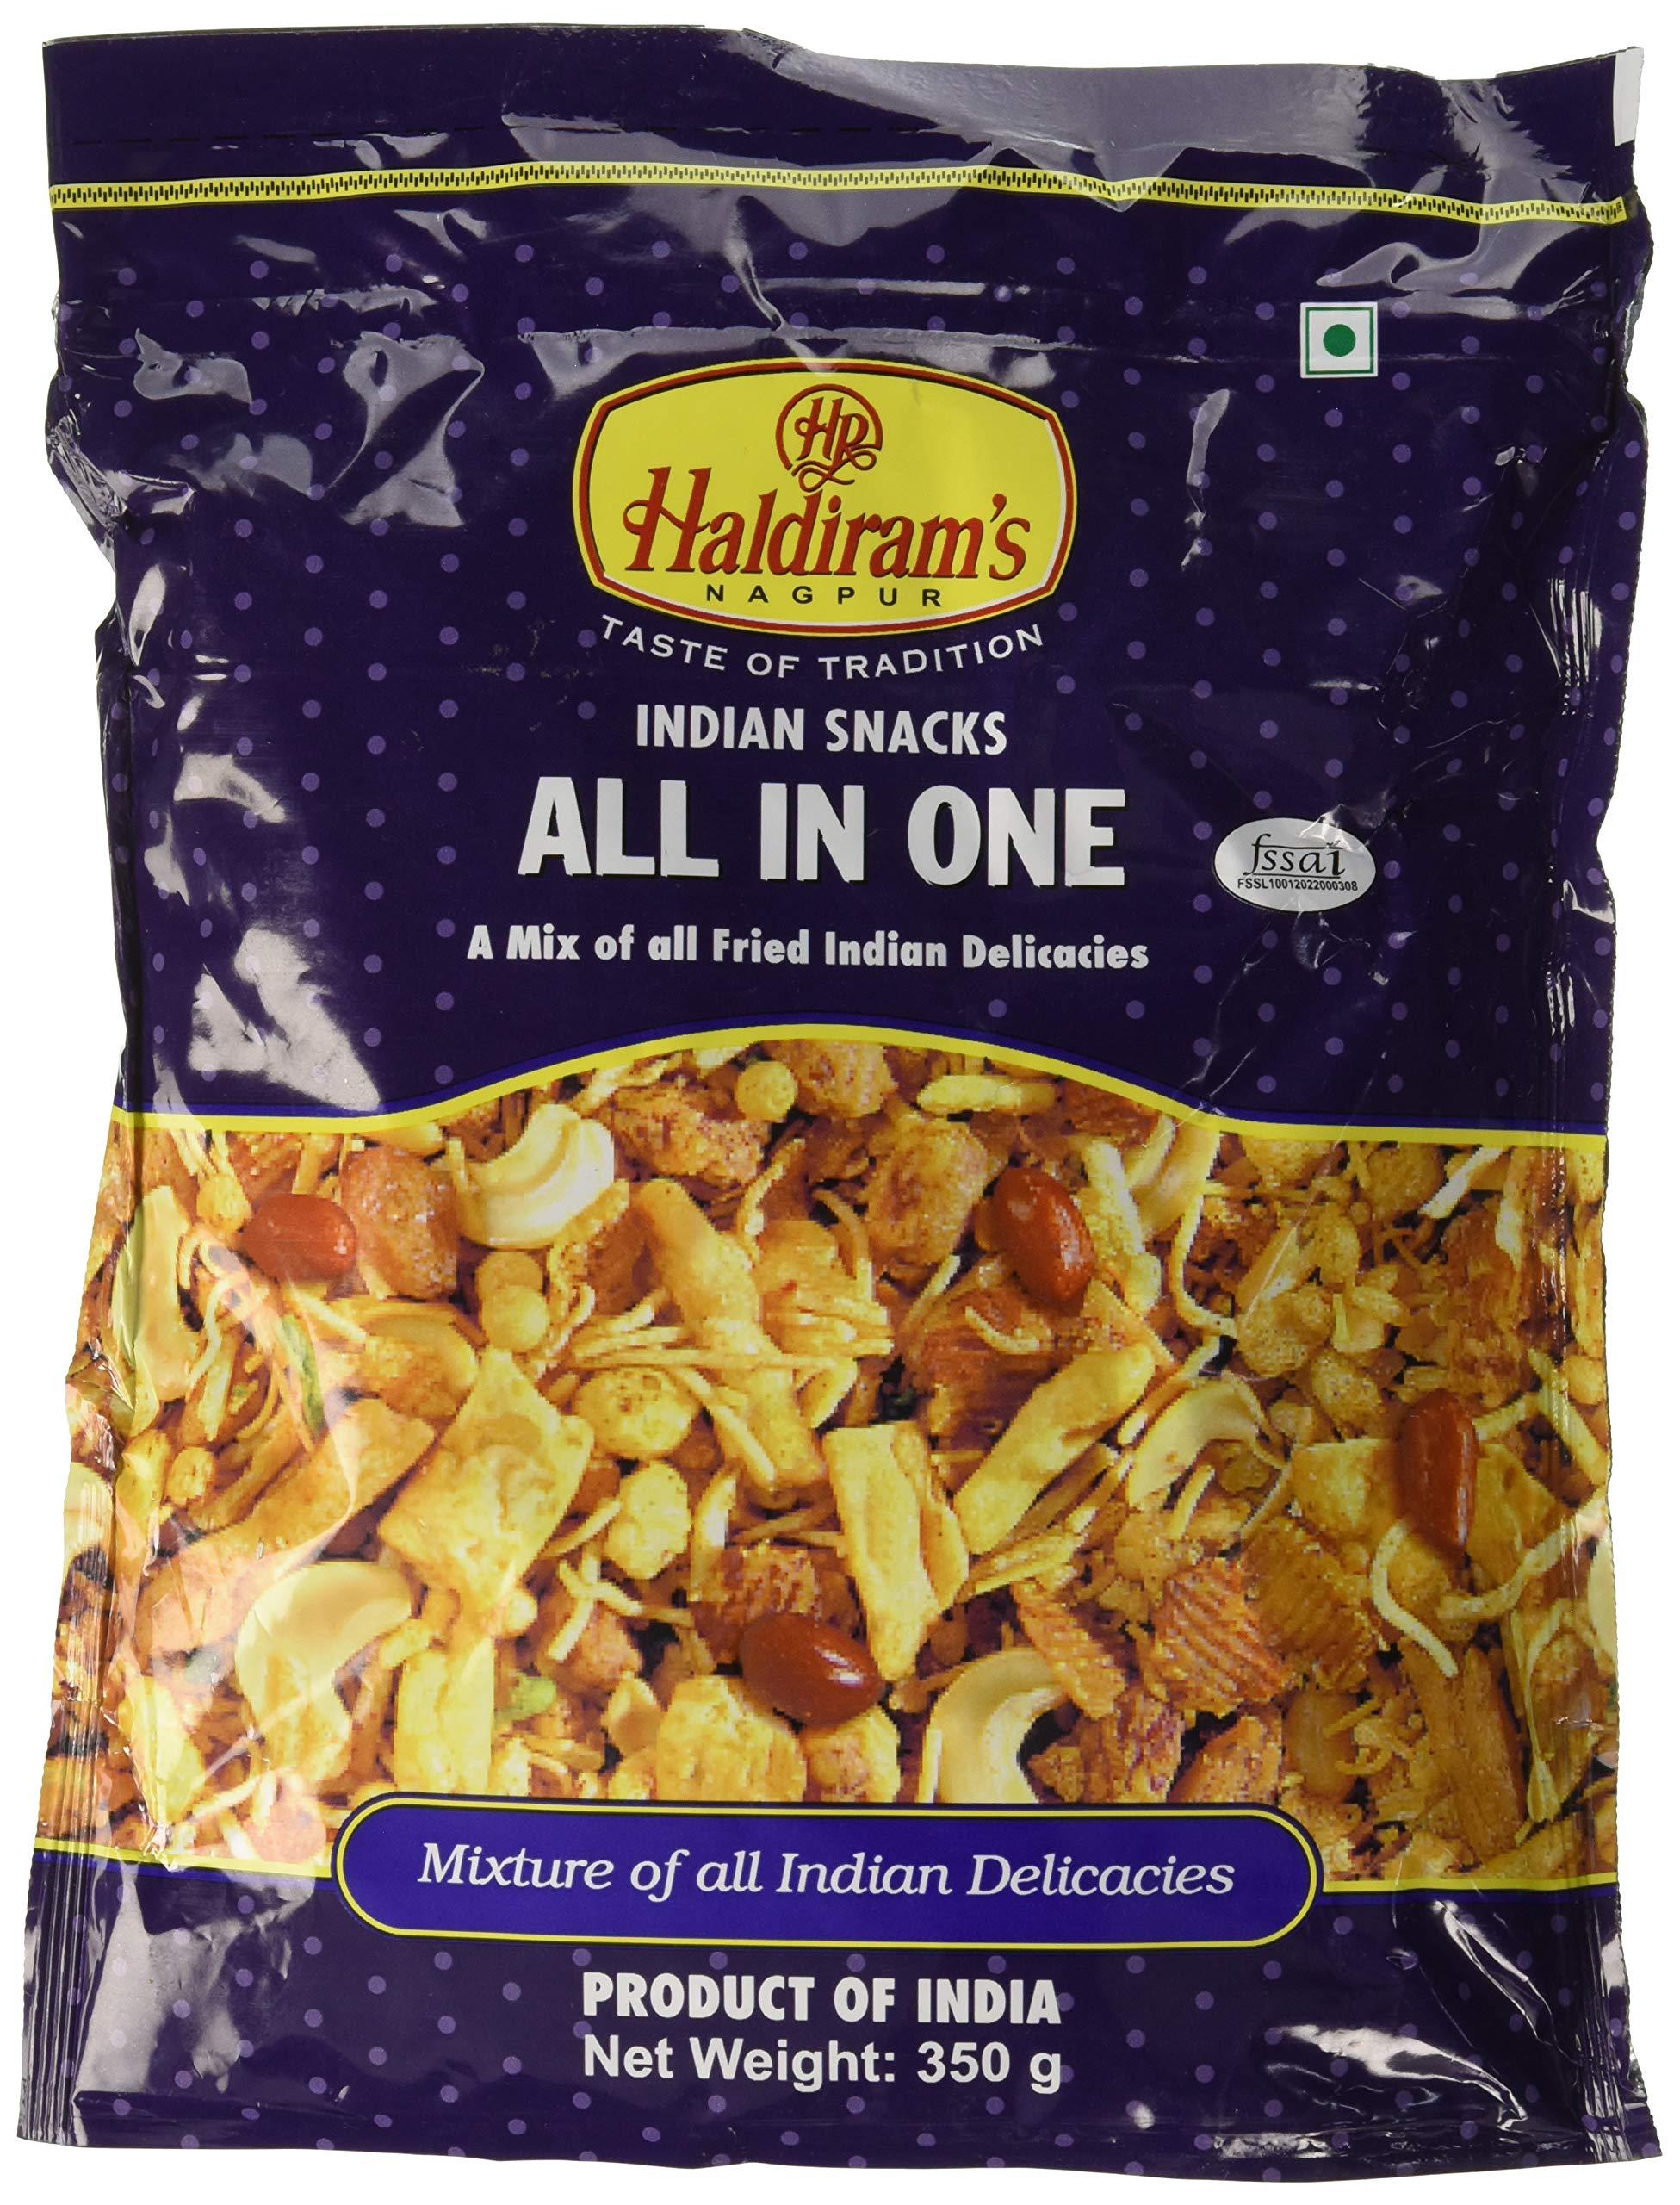 Haldiram's Nagpur All in One, 400g